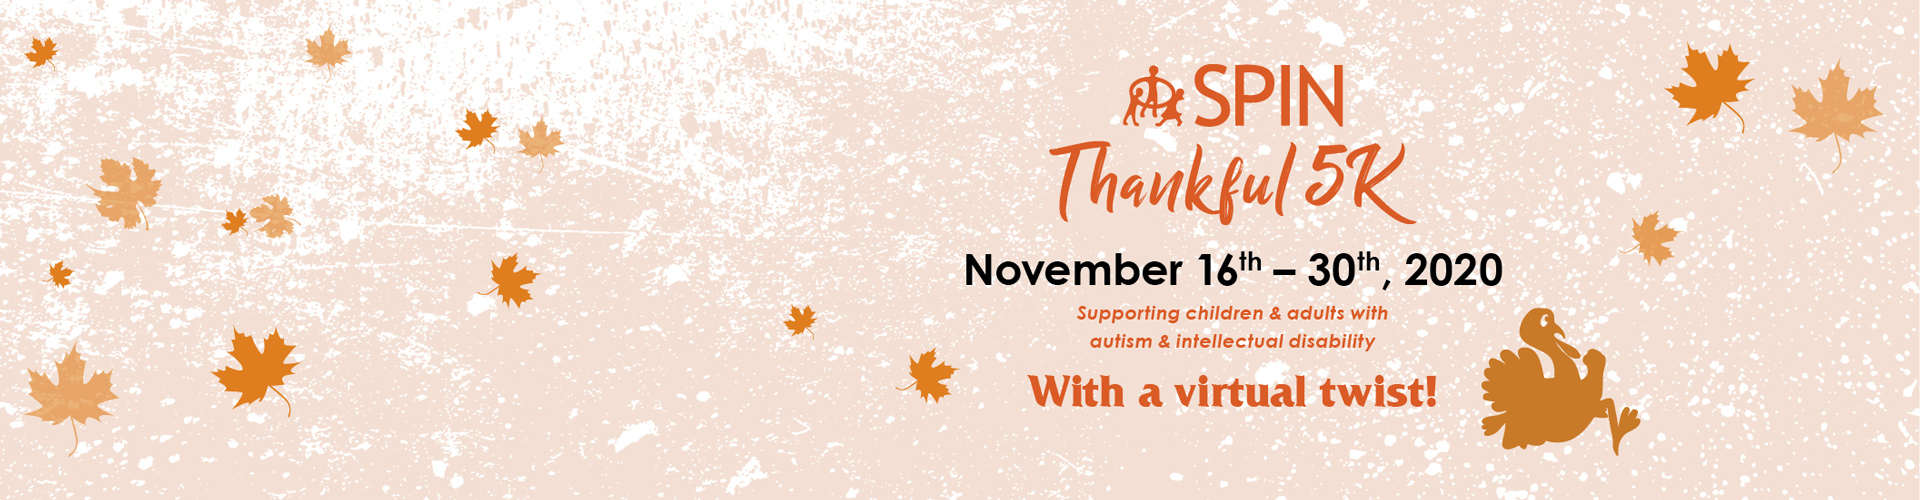 Thankful 5K